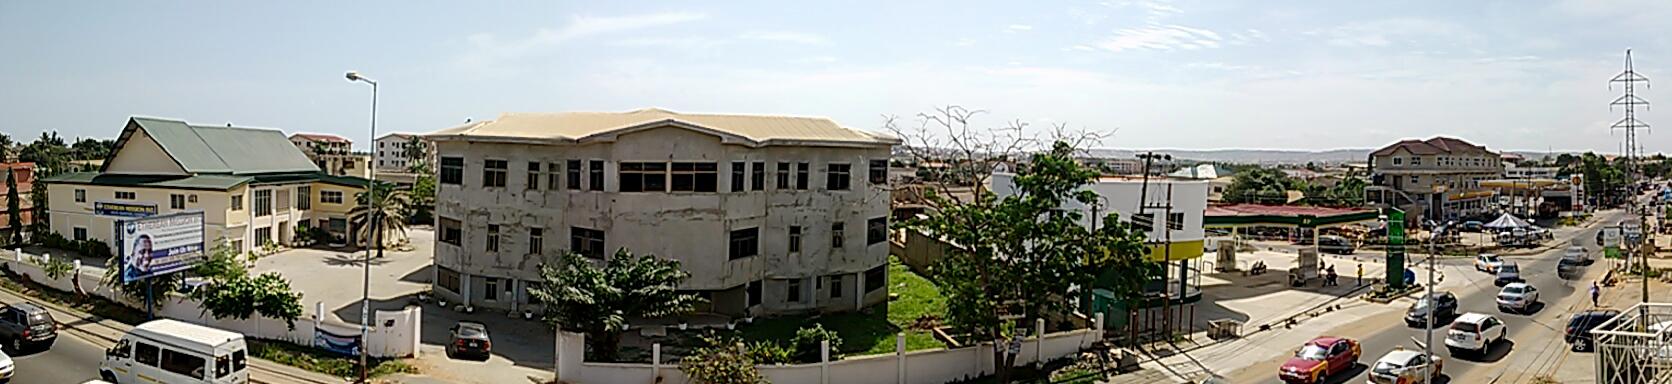 etherean hospital